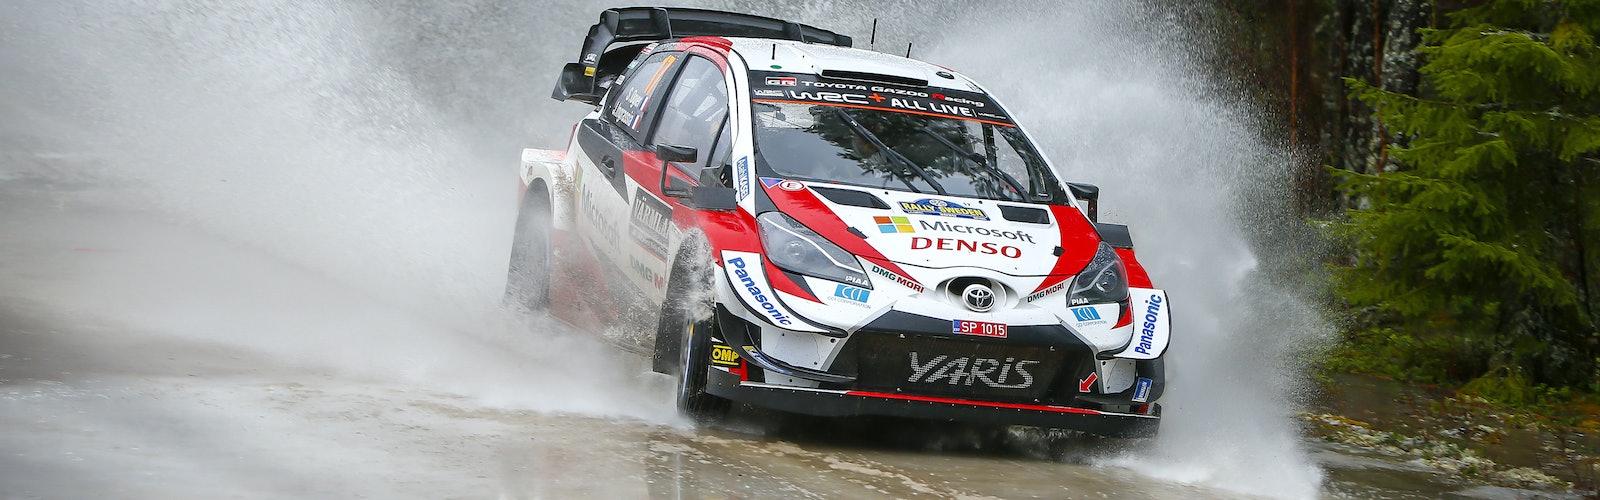 WRC_2020_Rd.2_251